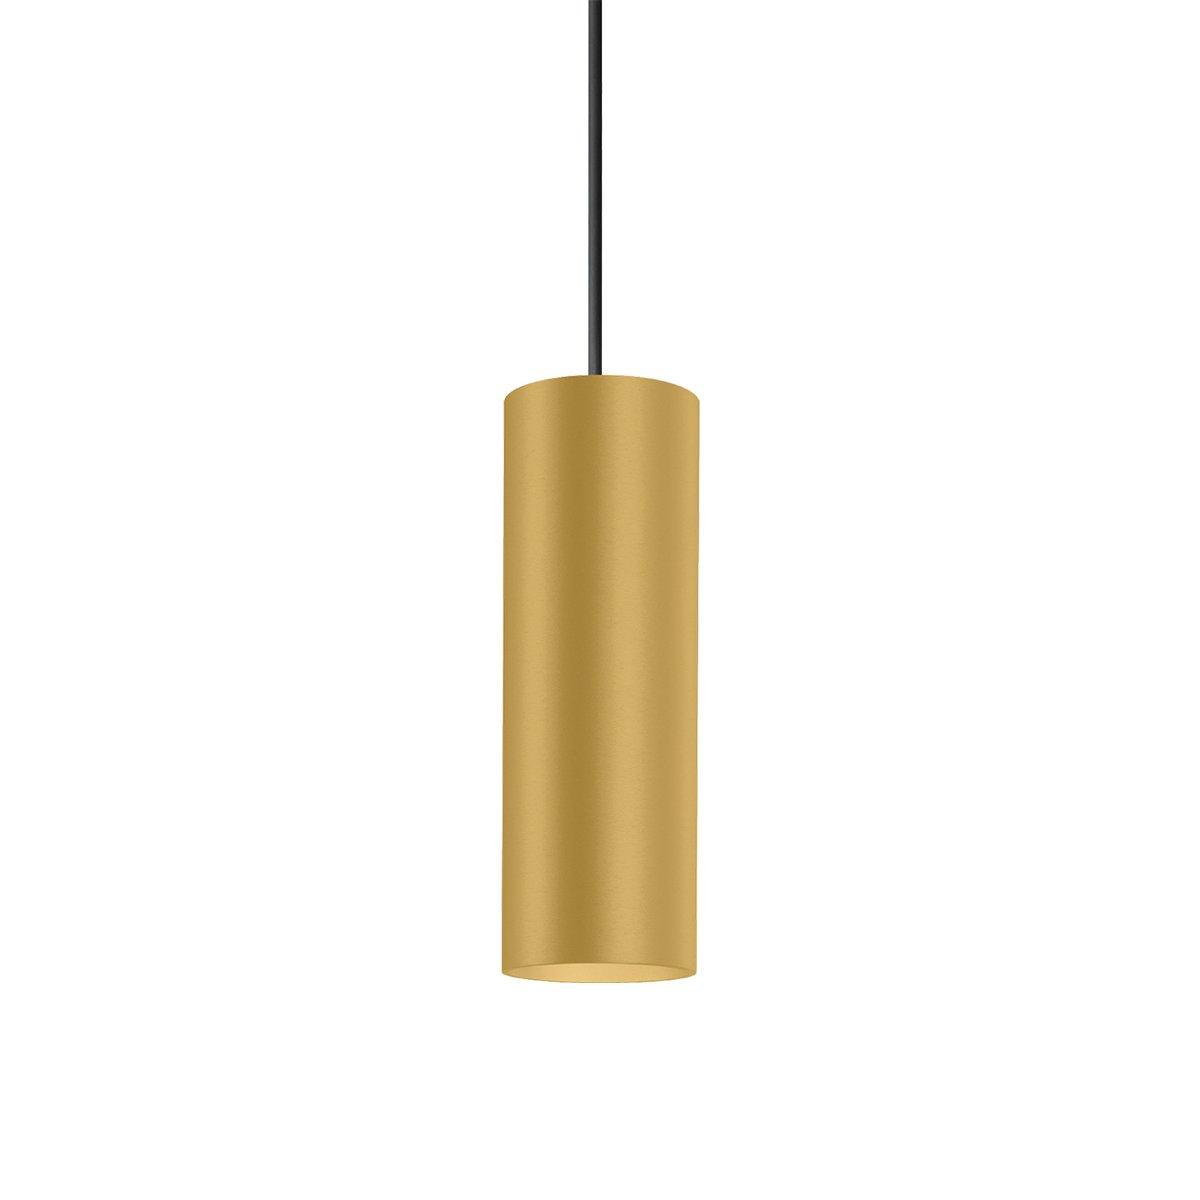 Wever & Ducr� Ray 2.0 Hanglamp Gold - GU10